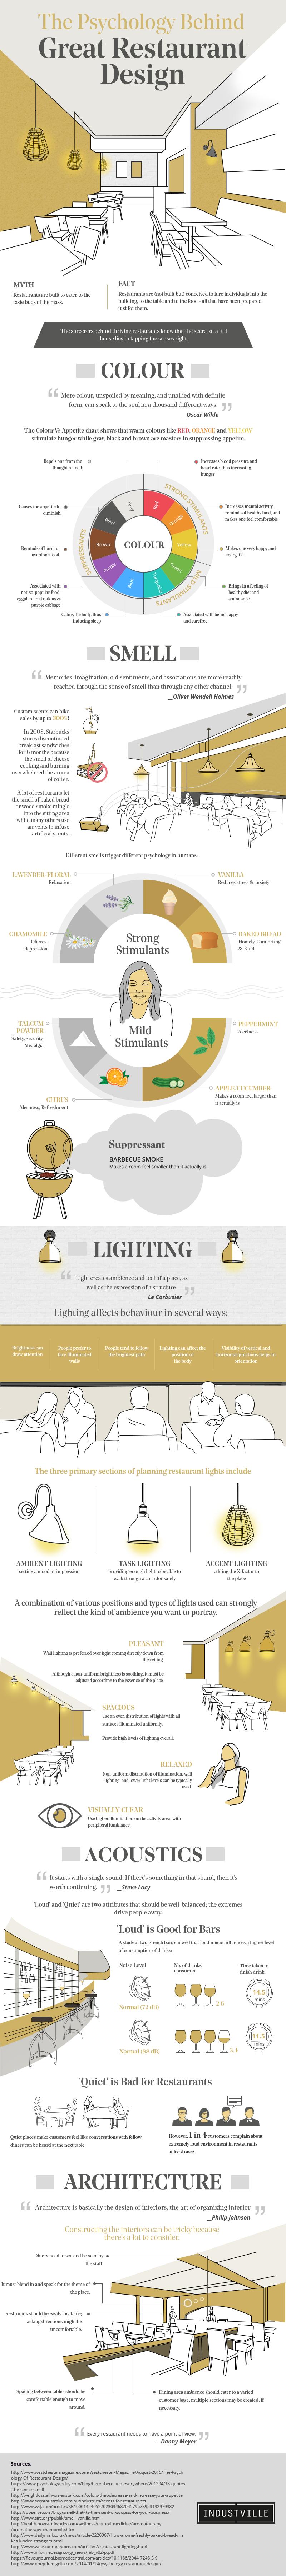 The Psychology Behind Great Restaurant Design (Infographic) | Modern Restaurant Management | The Business of Eating & Restaurant Management